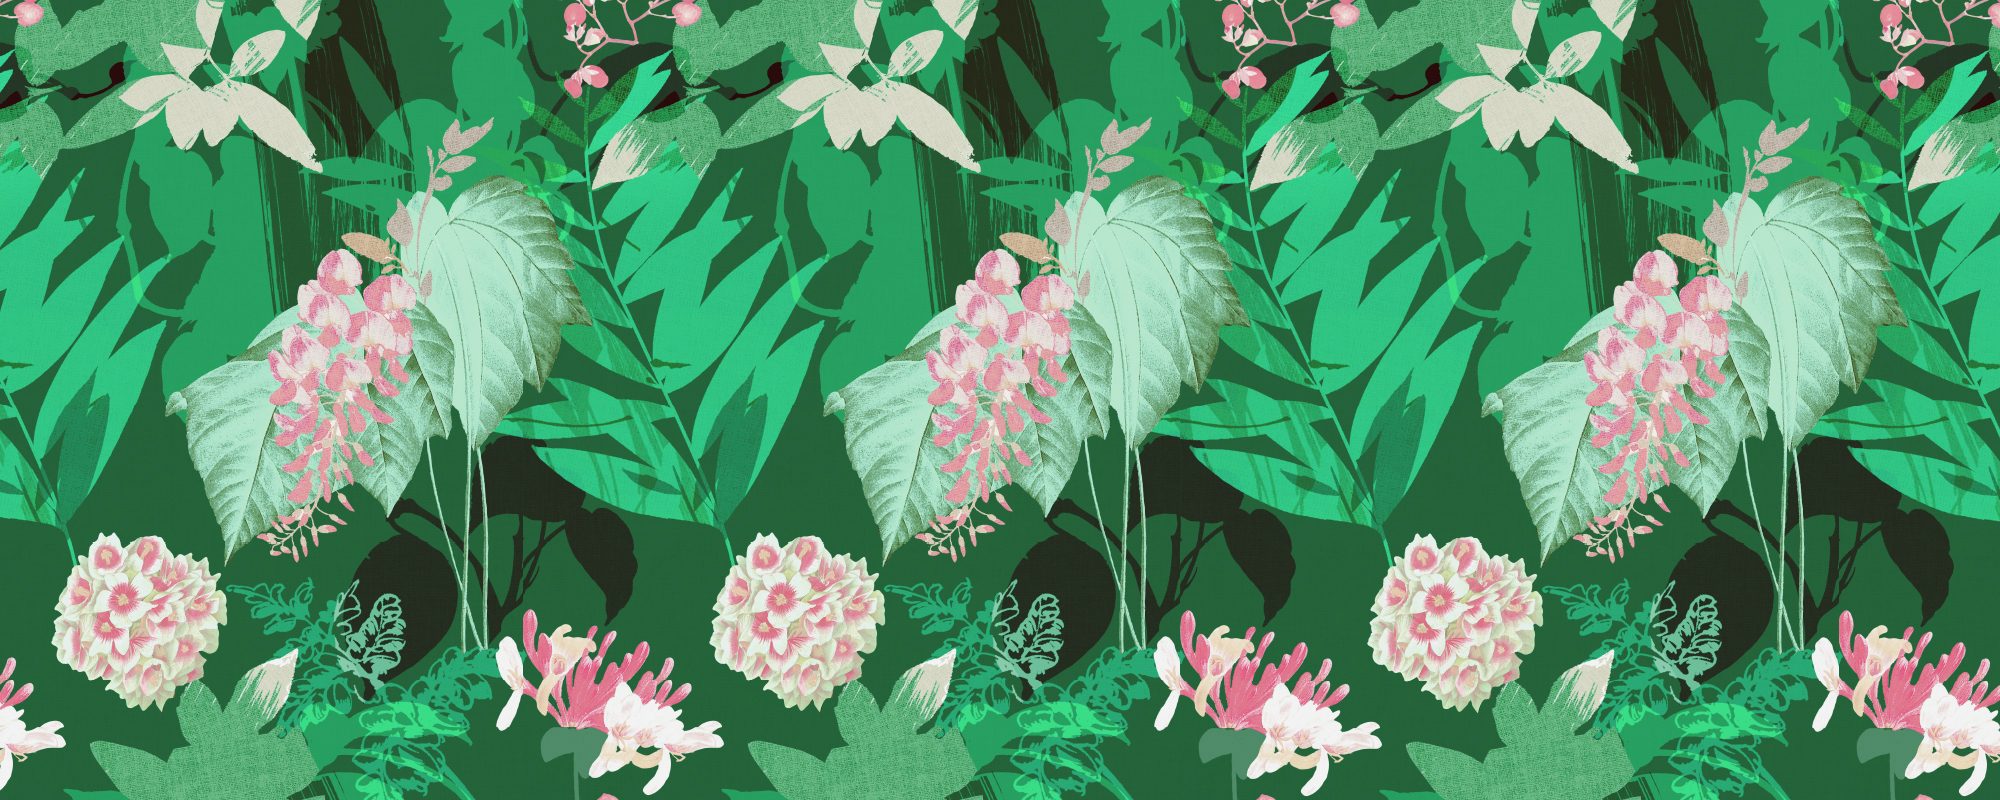 Papier peint motif fleurs vert et rose